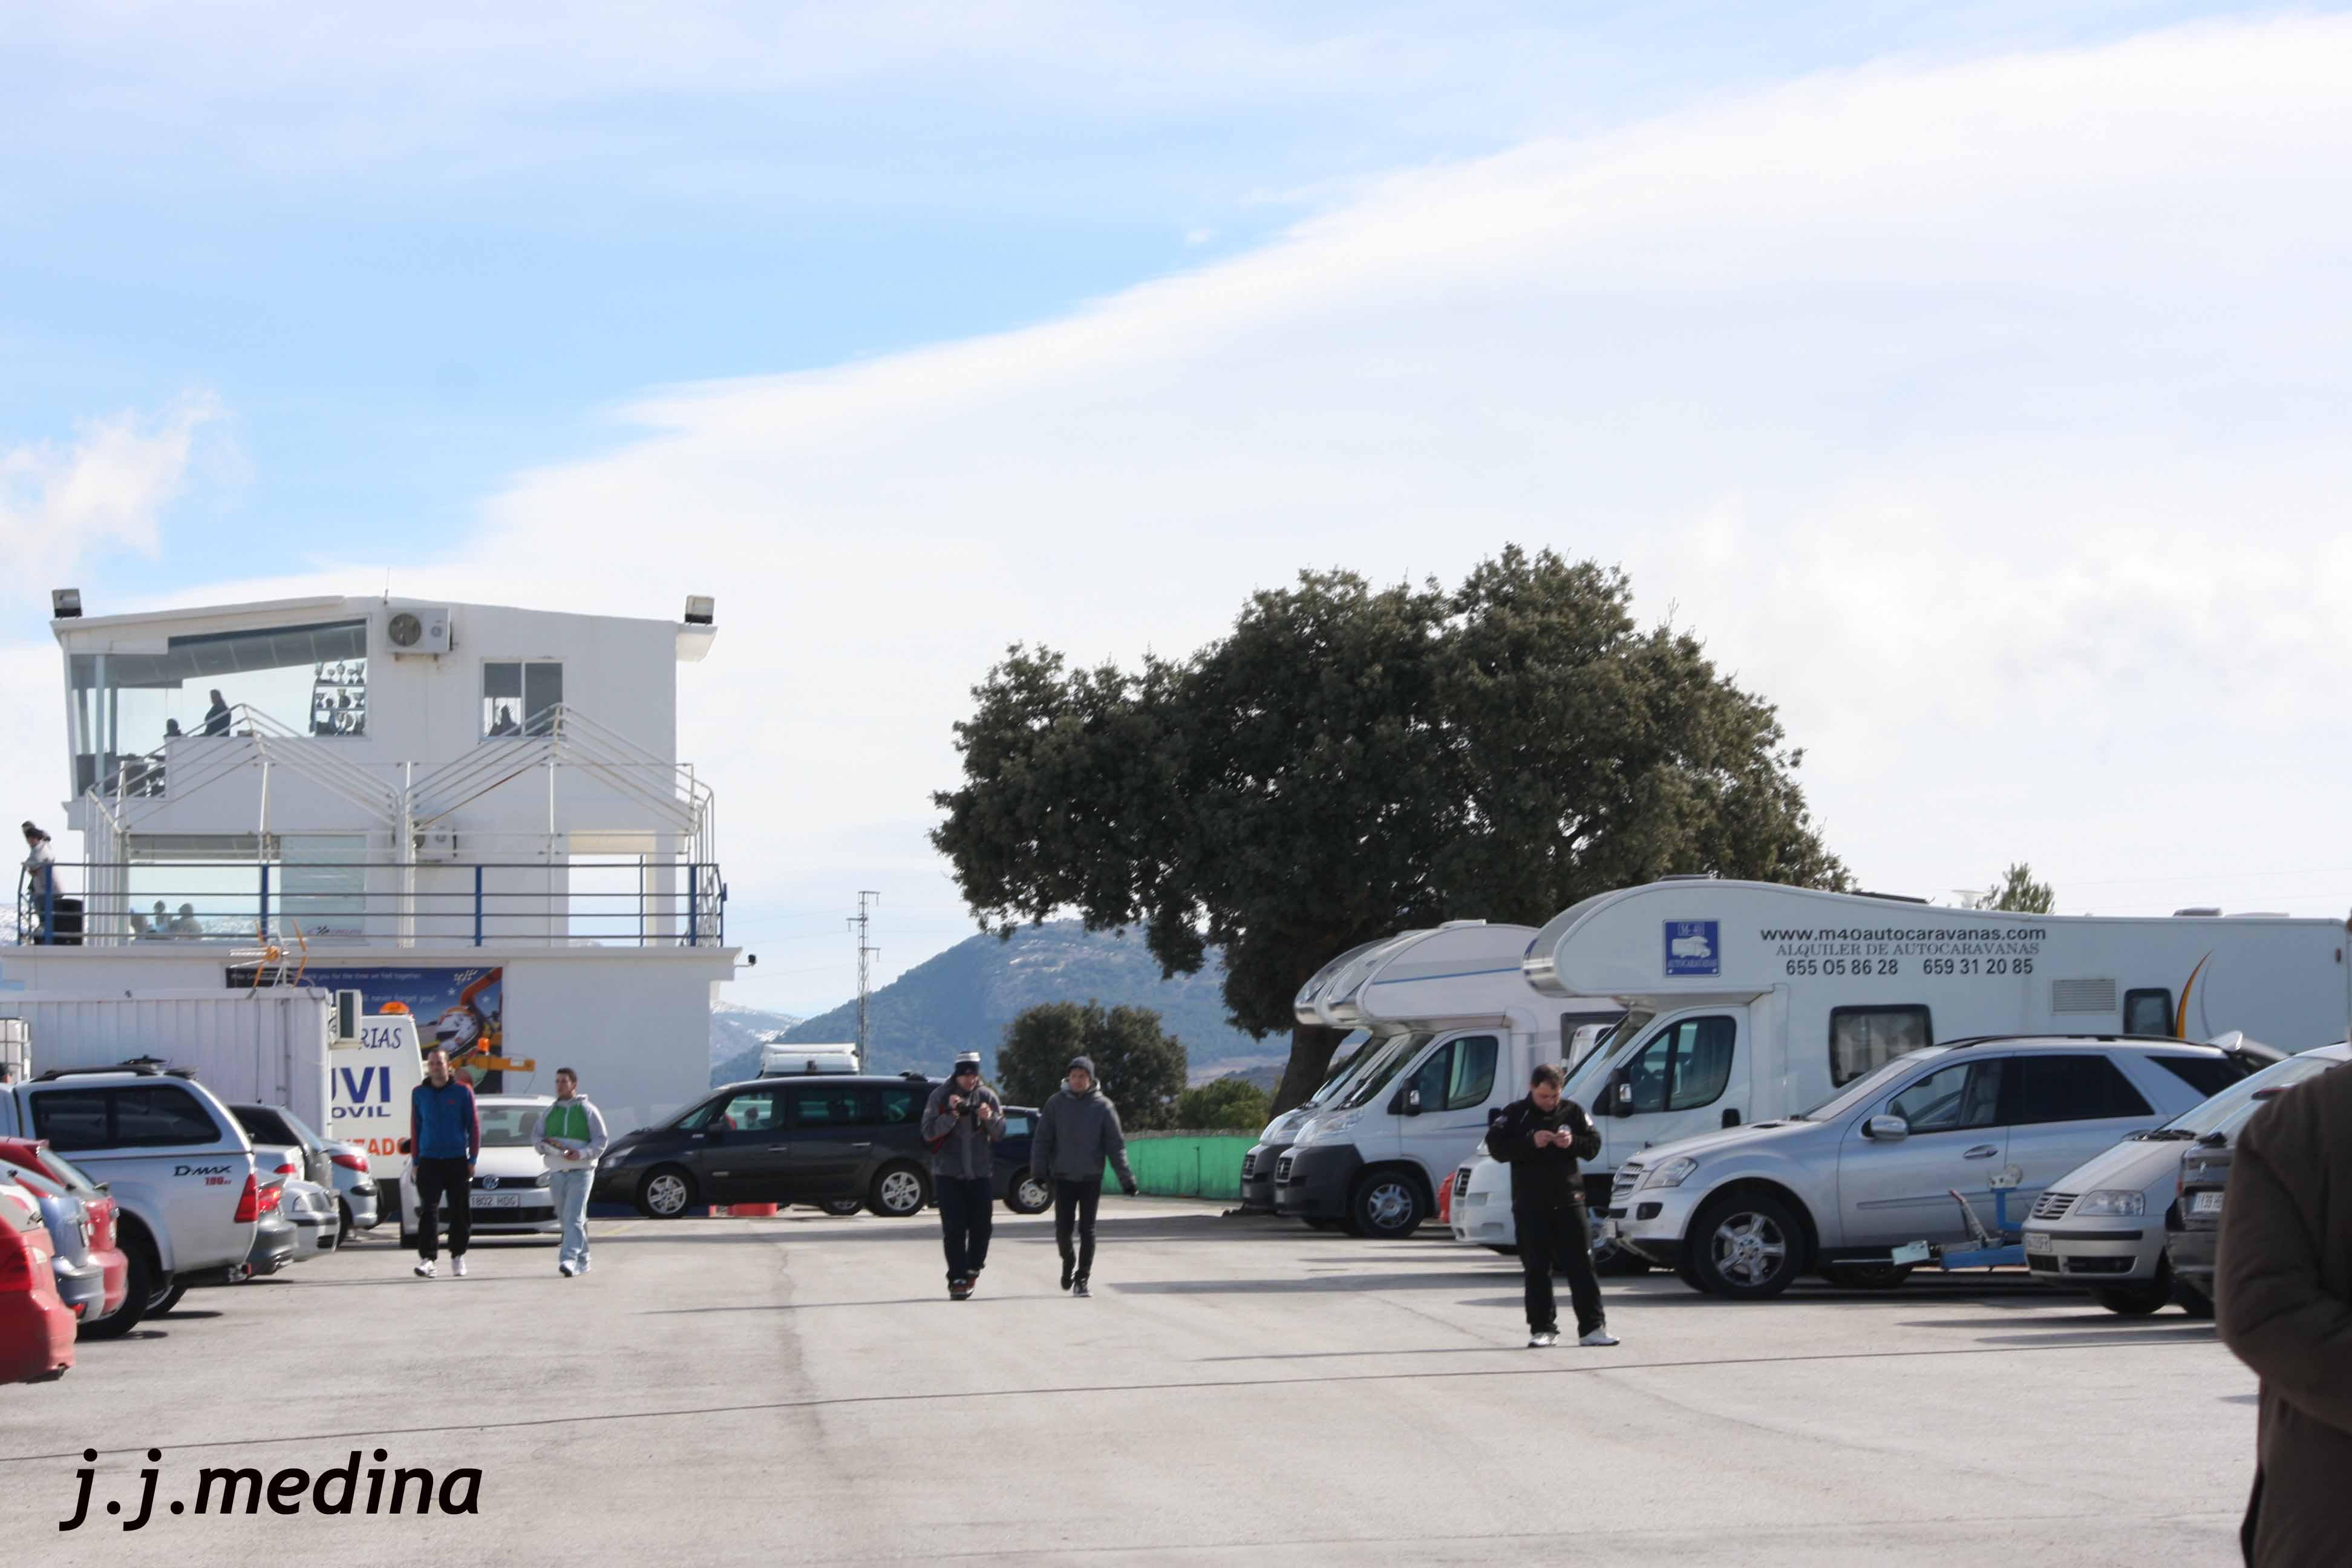 Circuito Guadix : Circuito guadix mayo tandas octanos u octanos